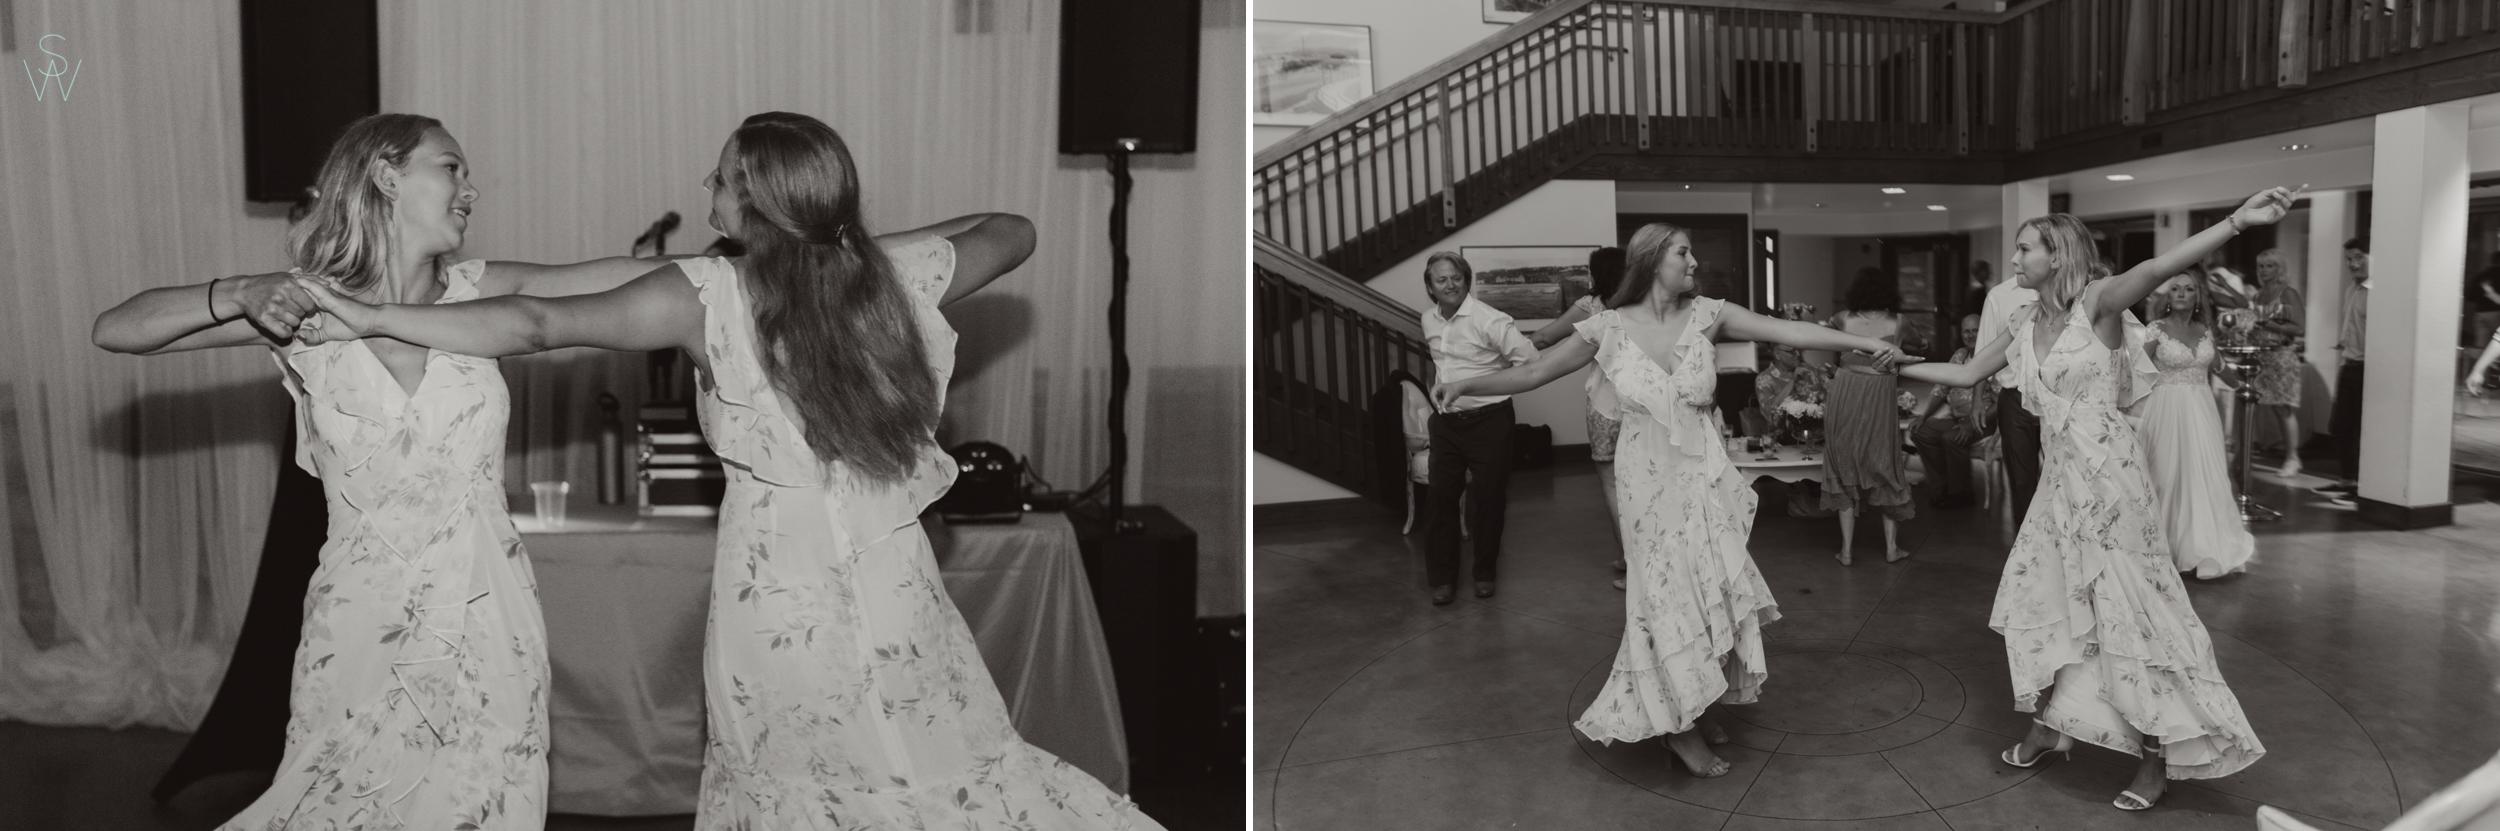 170DEL.MAR.WEDDINGS.photography.shewanders.JPG